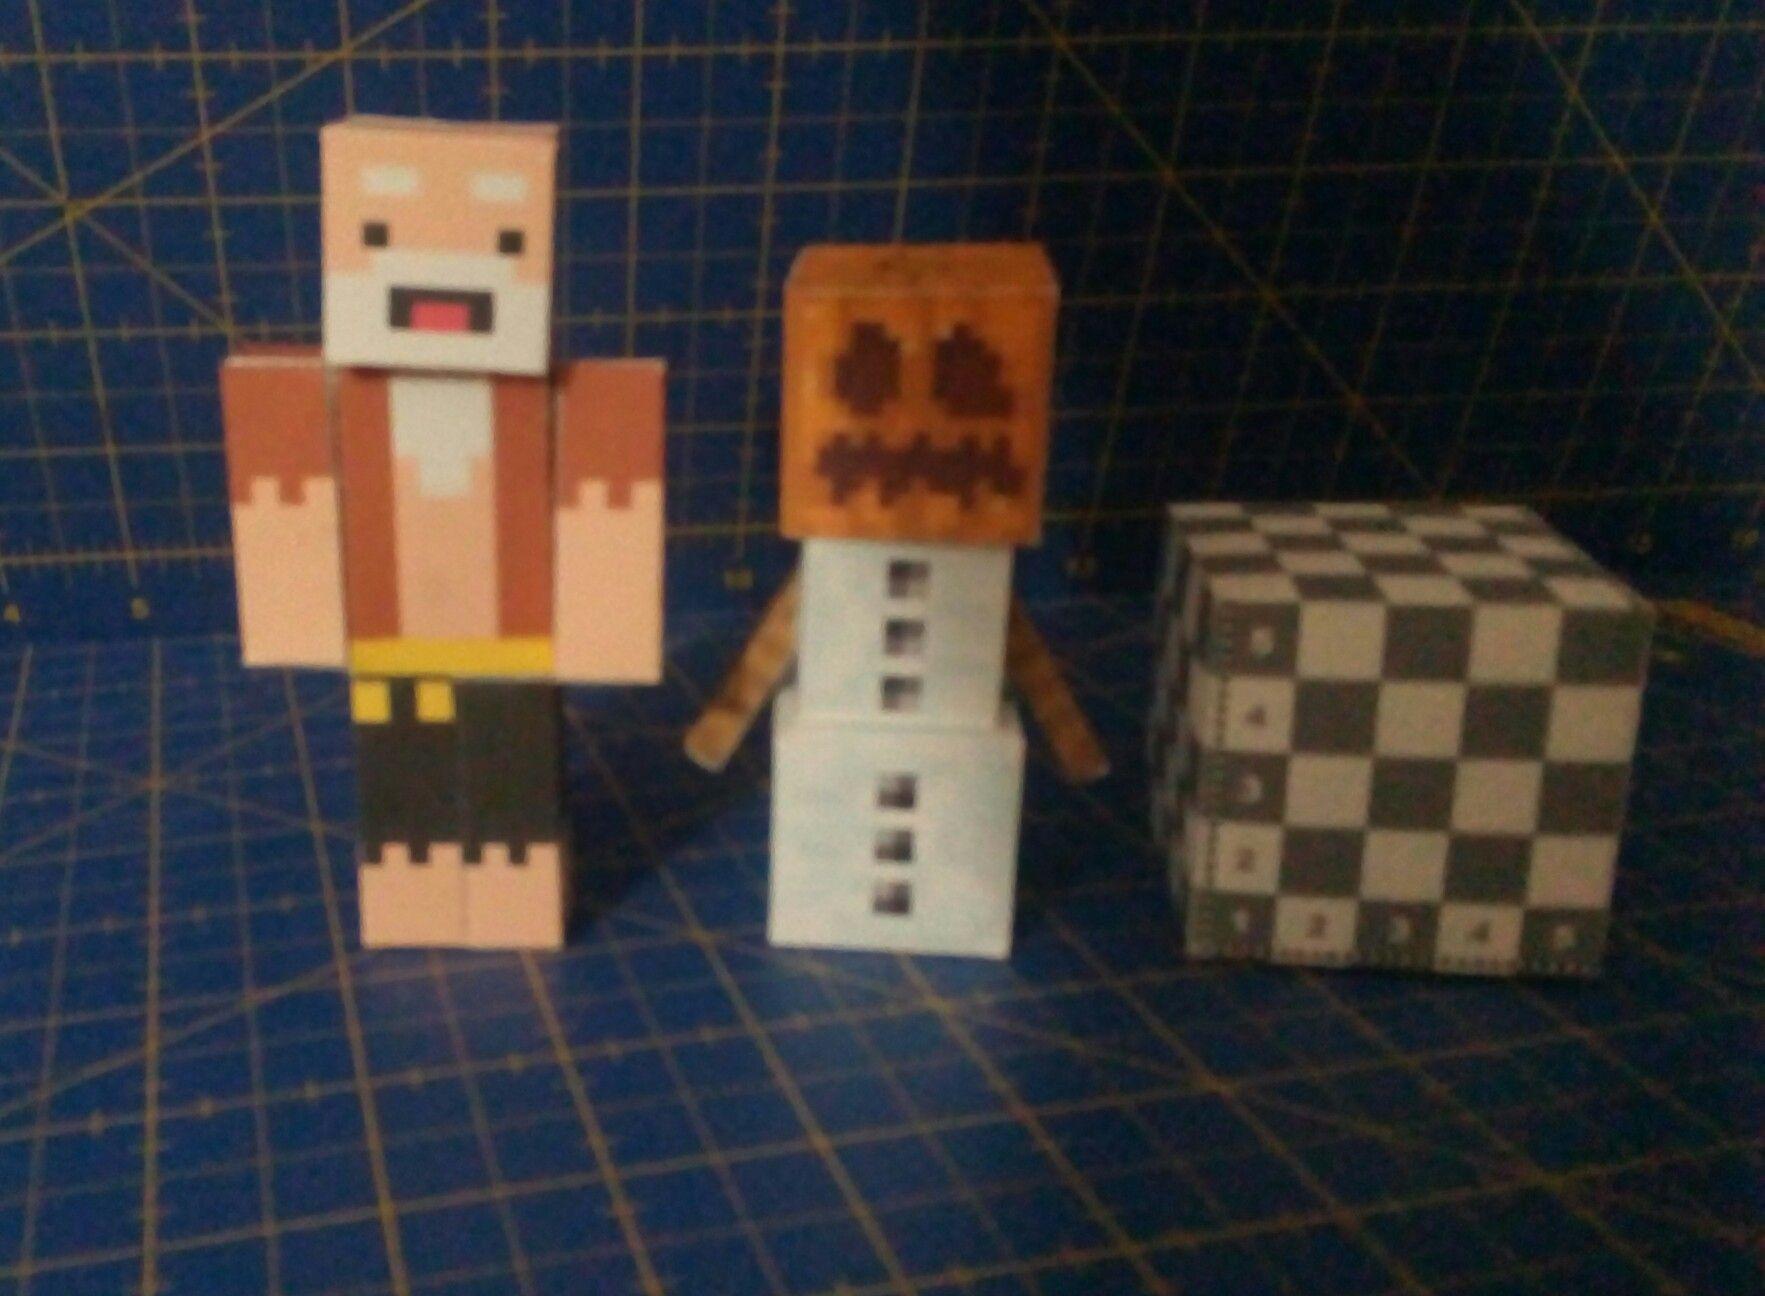 Minecraft Papercraft Review Pacheco Cara Floja Y yeti Papercraft